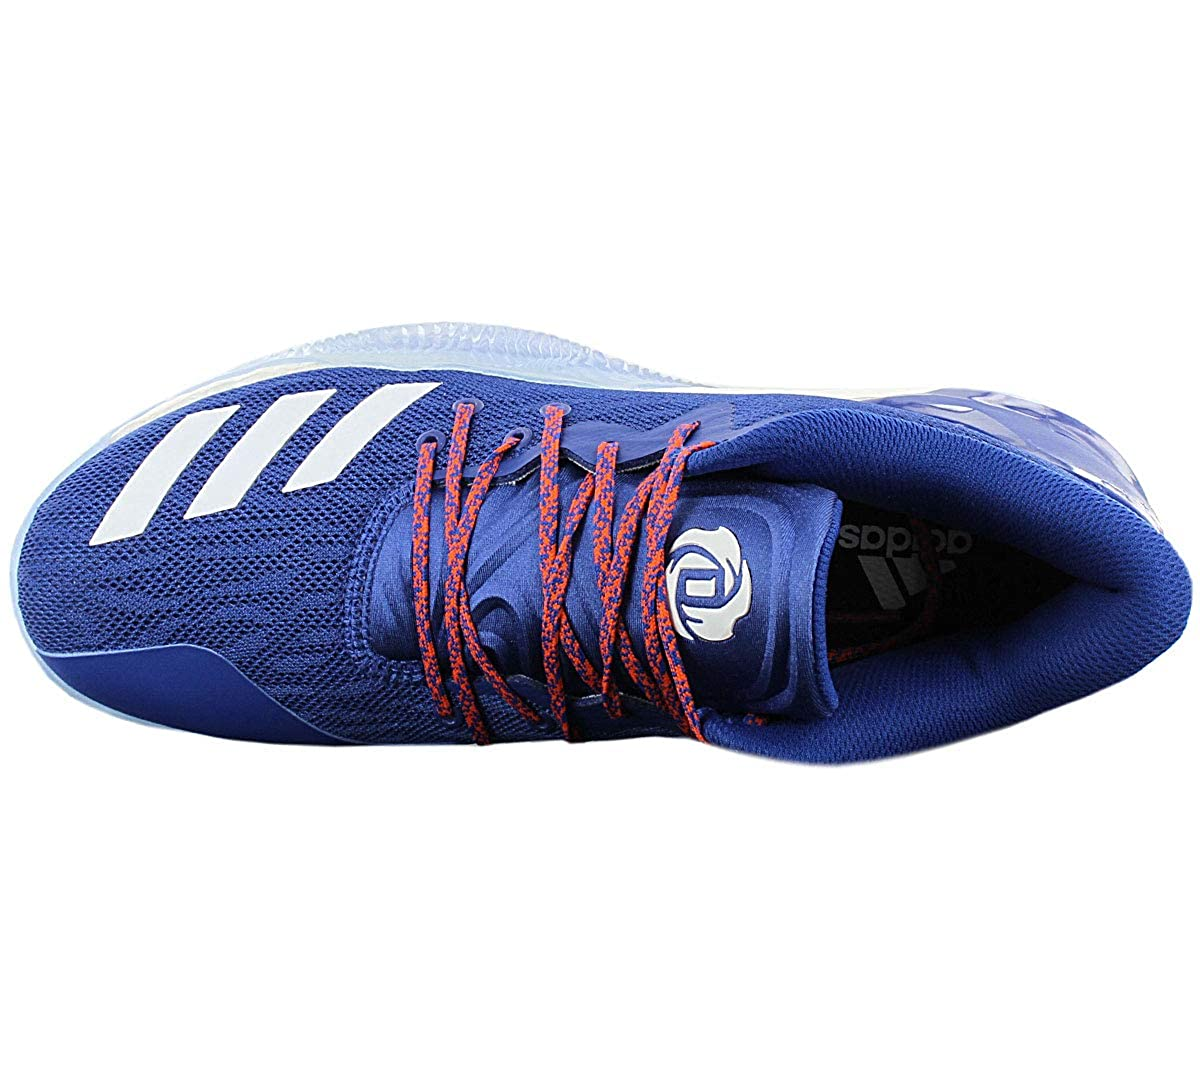 the latest 493c3 ad68c adidas - D Rose 7 Low, Scarpe Sportive Uomo  Amazon.it  Scarpe e borse